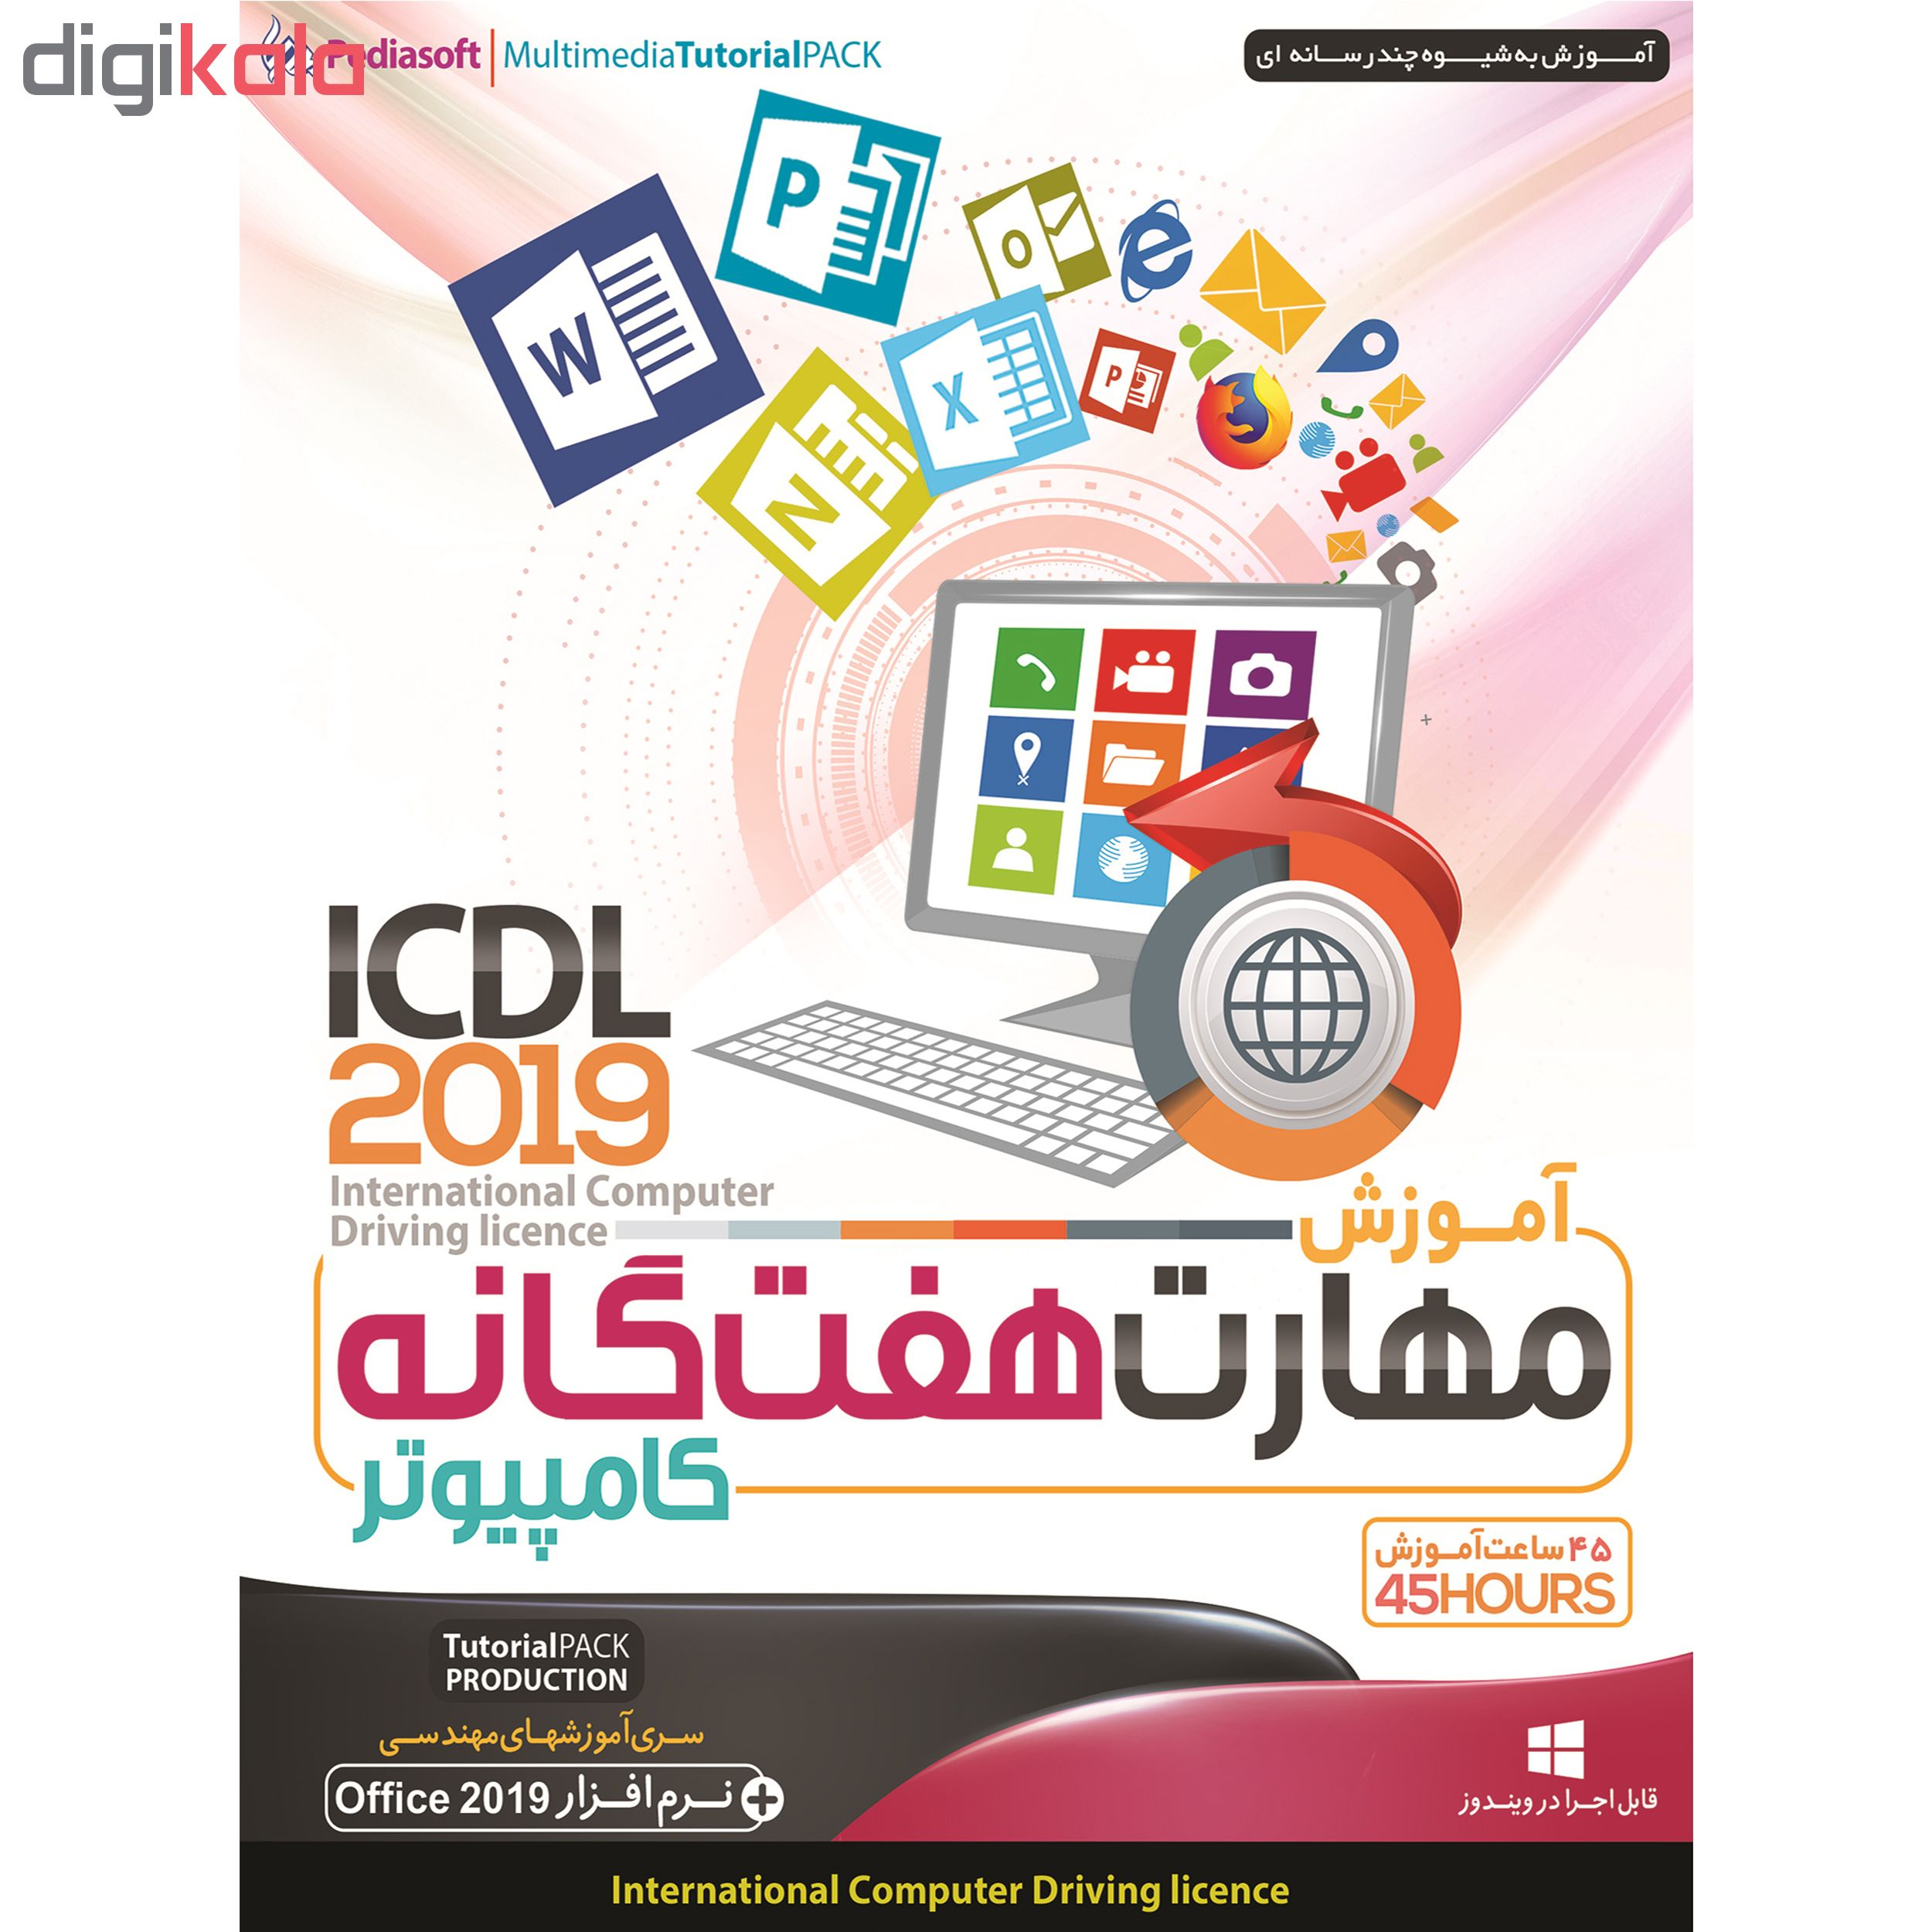 نرم افزار آموزش مهارت هفتگانه کامپیوتر ICDL 2019 نشر پدیا سافت به همراه نرم افزار آموزش ICDL 2016 نشر درنا